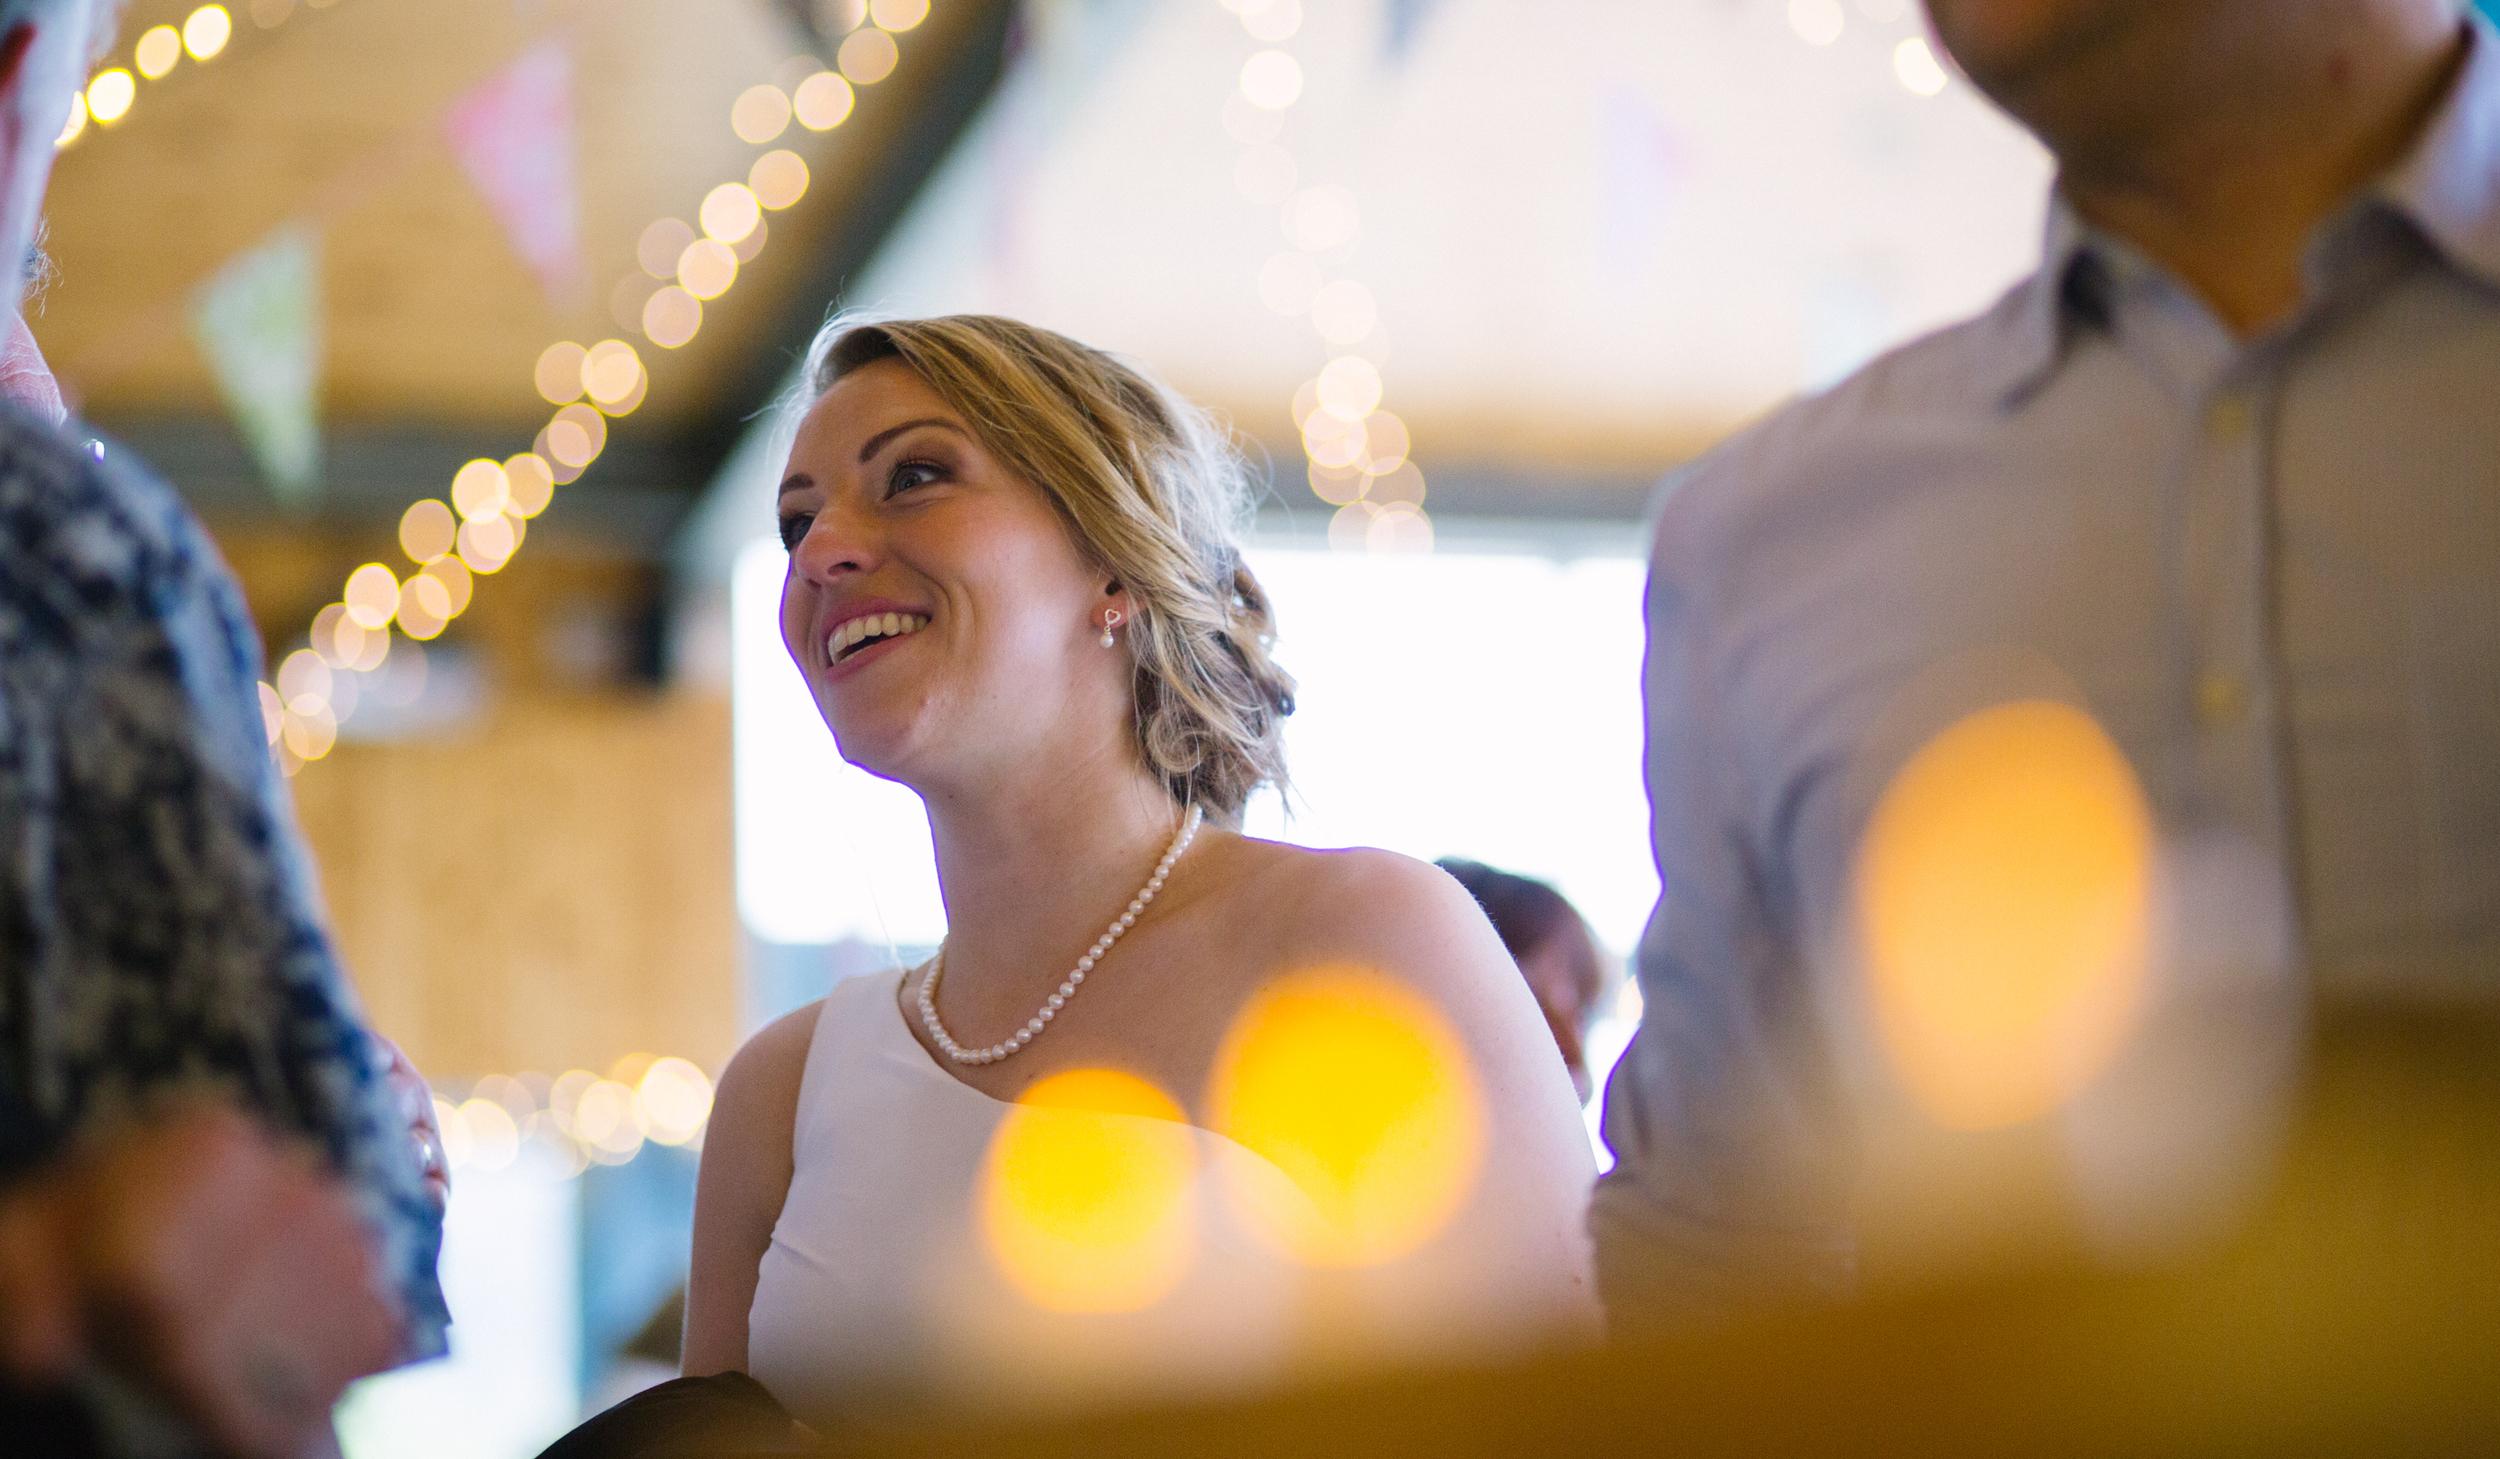 dartmouth-beach-wedding-reception-1-london-uk-destination-wedding-photography-Adam-Rowley